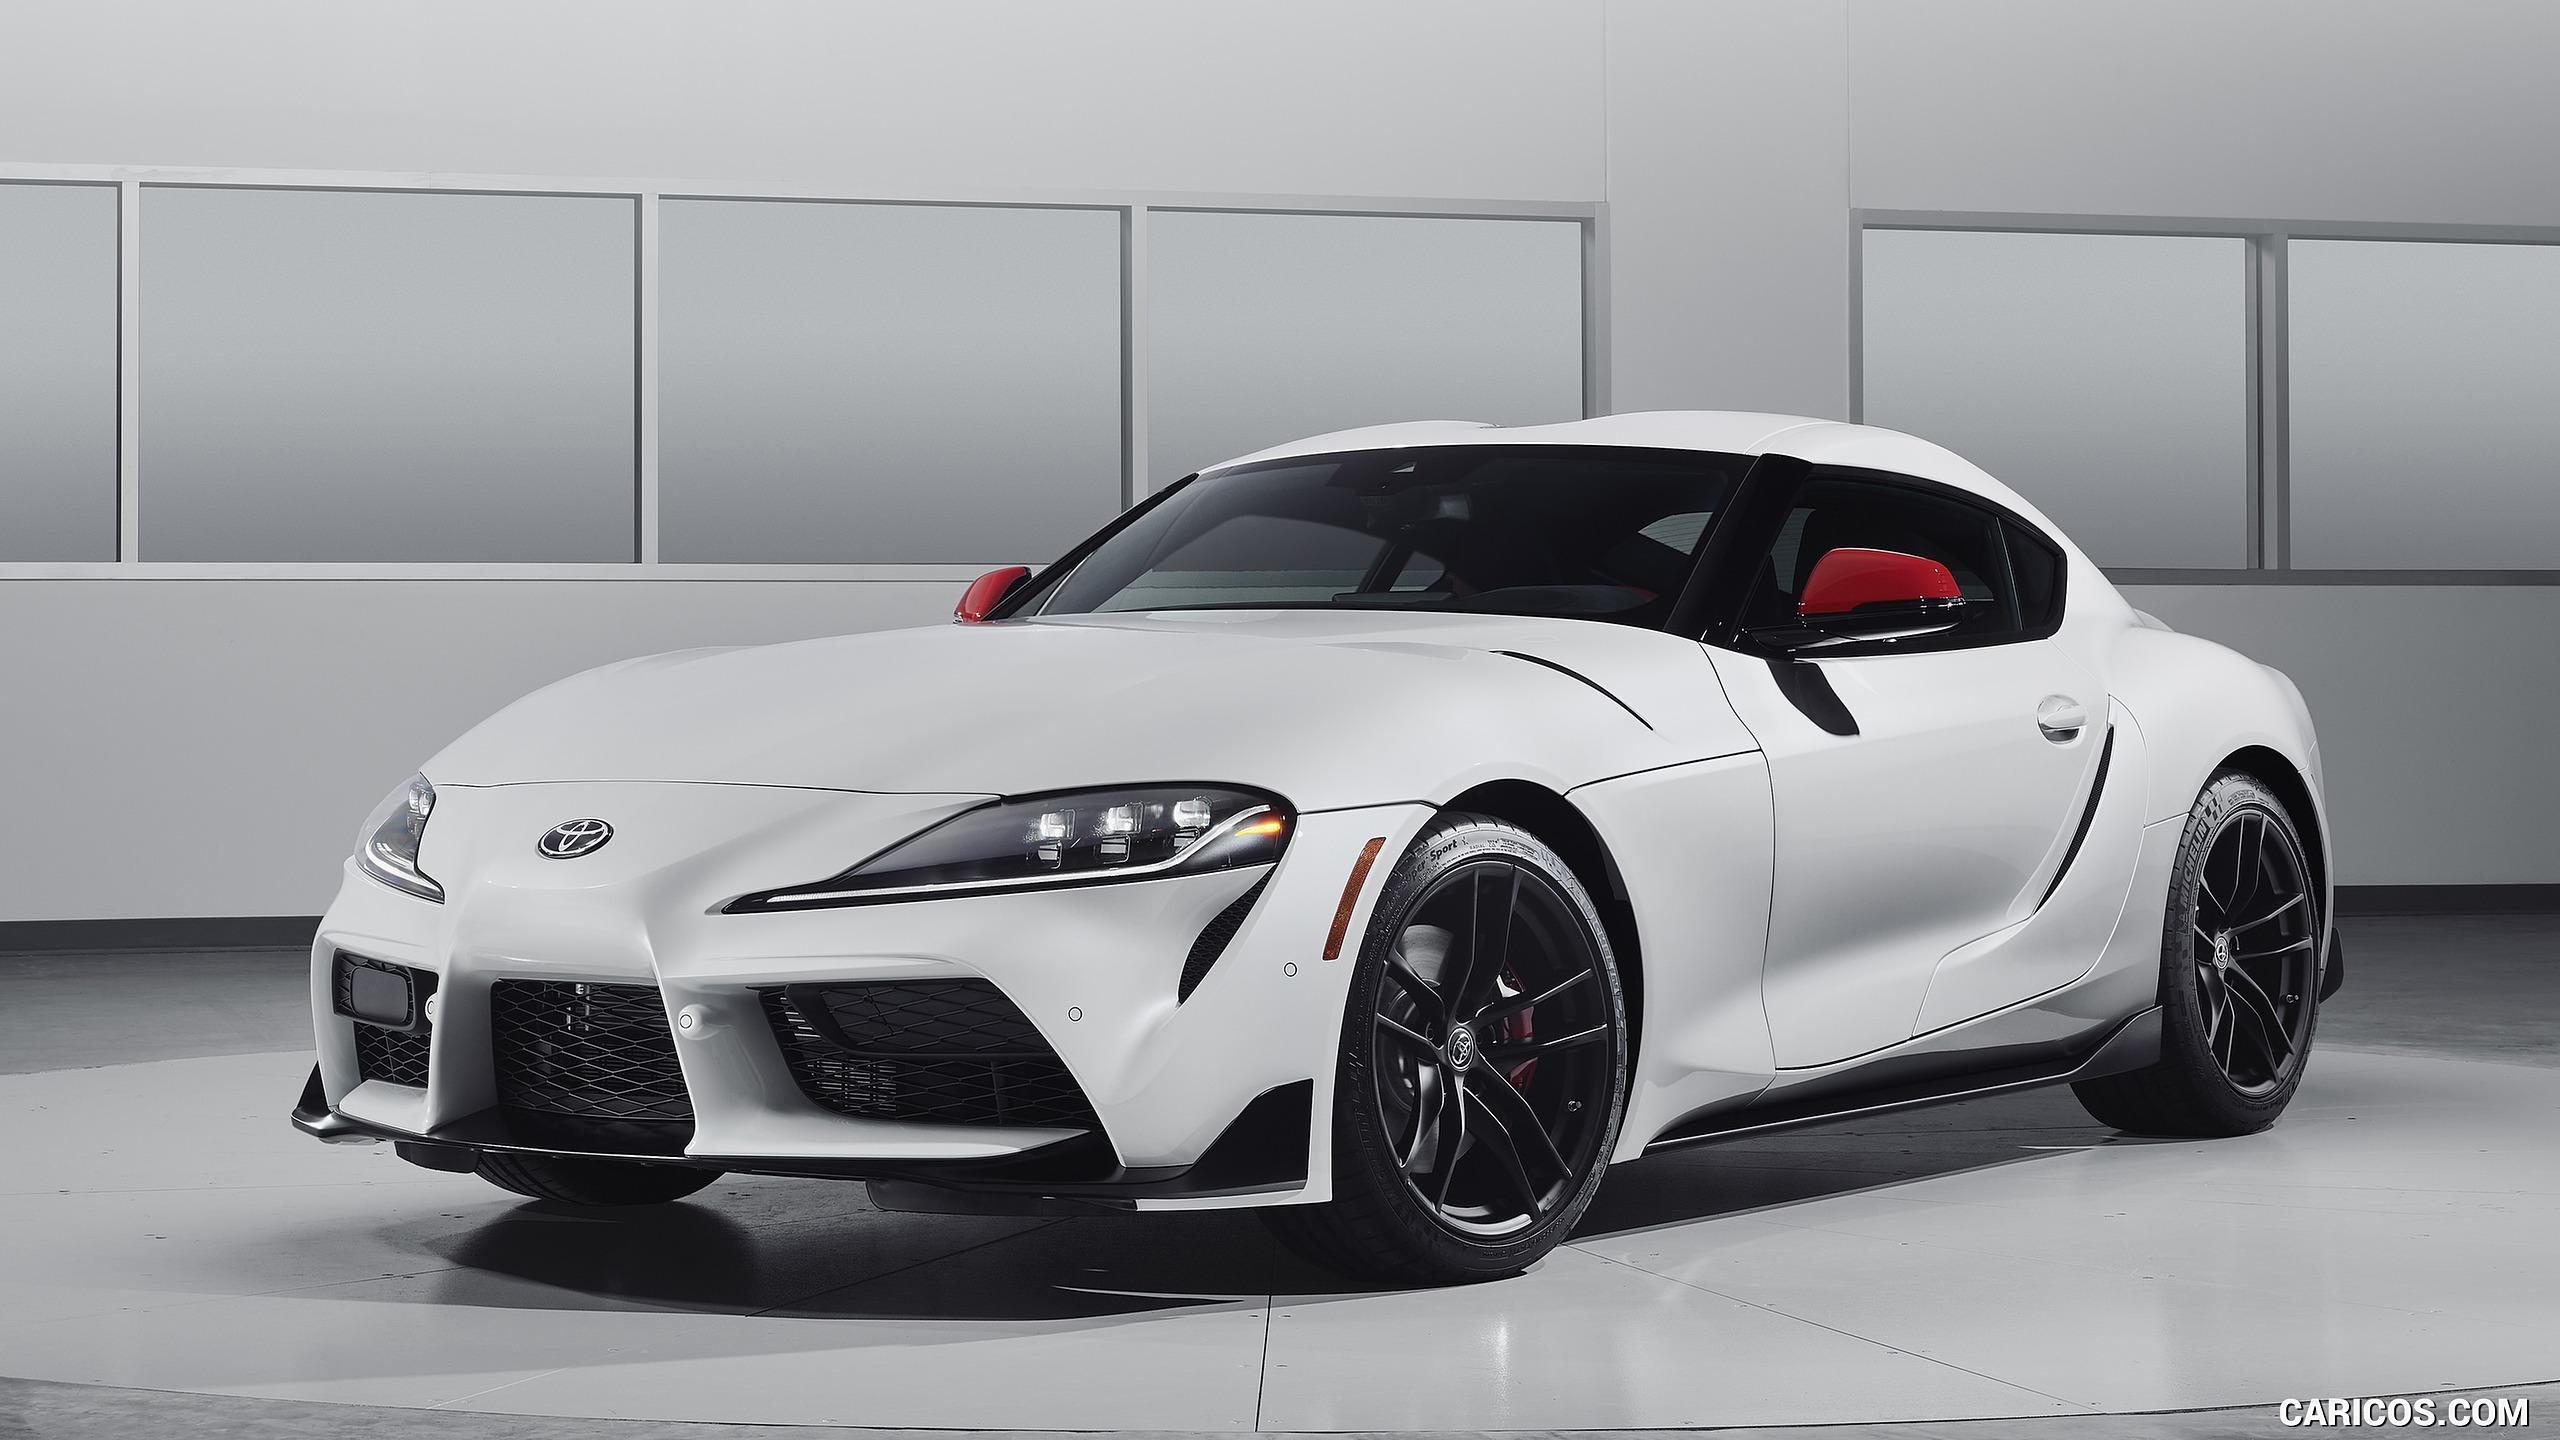 2020 Toyota Supra Launch Edition   Front Three Quarter HD 2560x1440